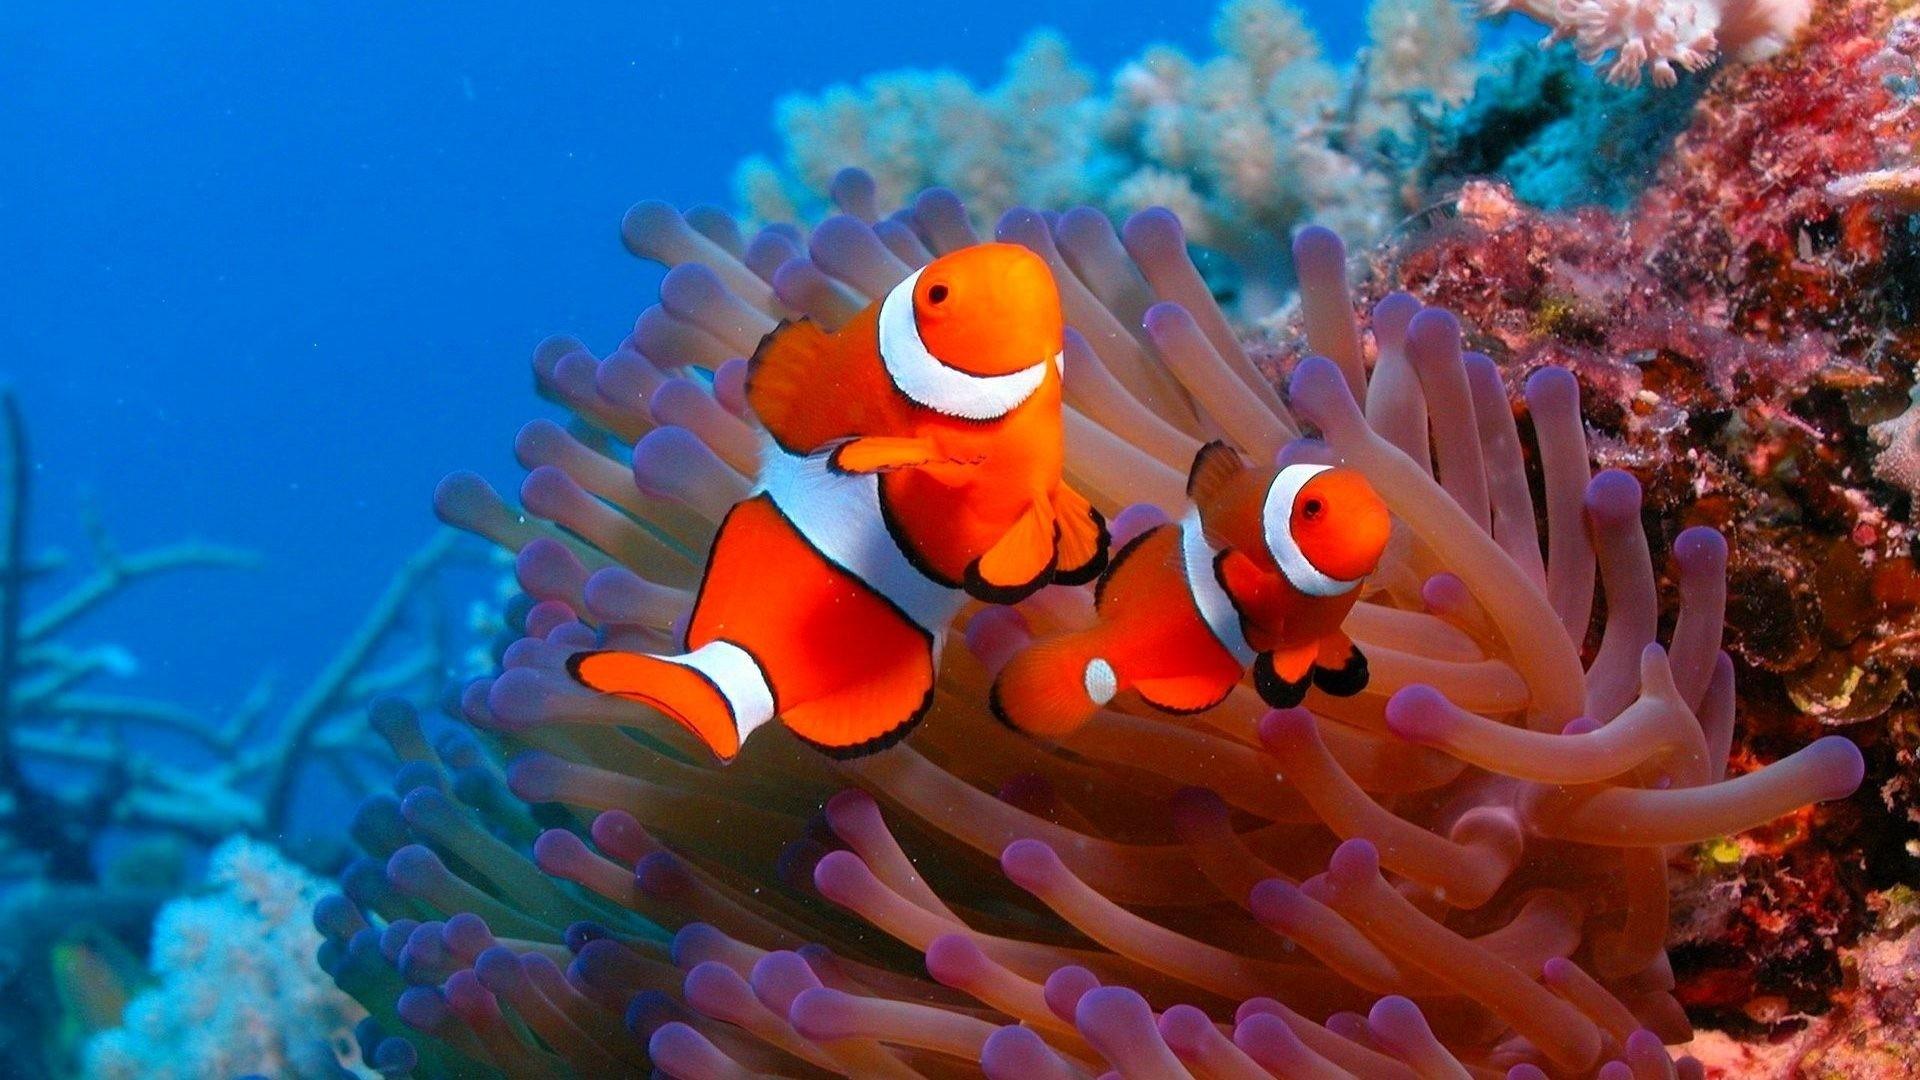 HD Ocean Sea Life Wallpapers (47+ images)